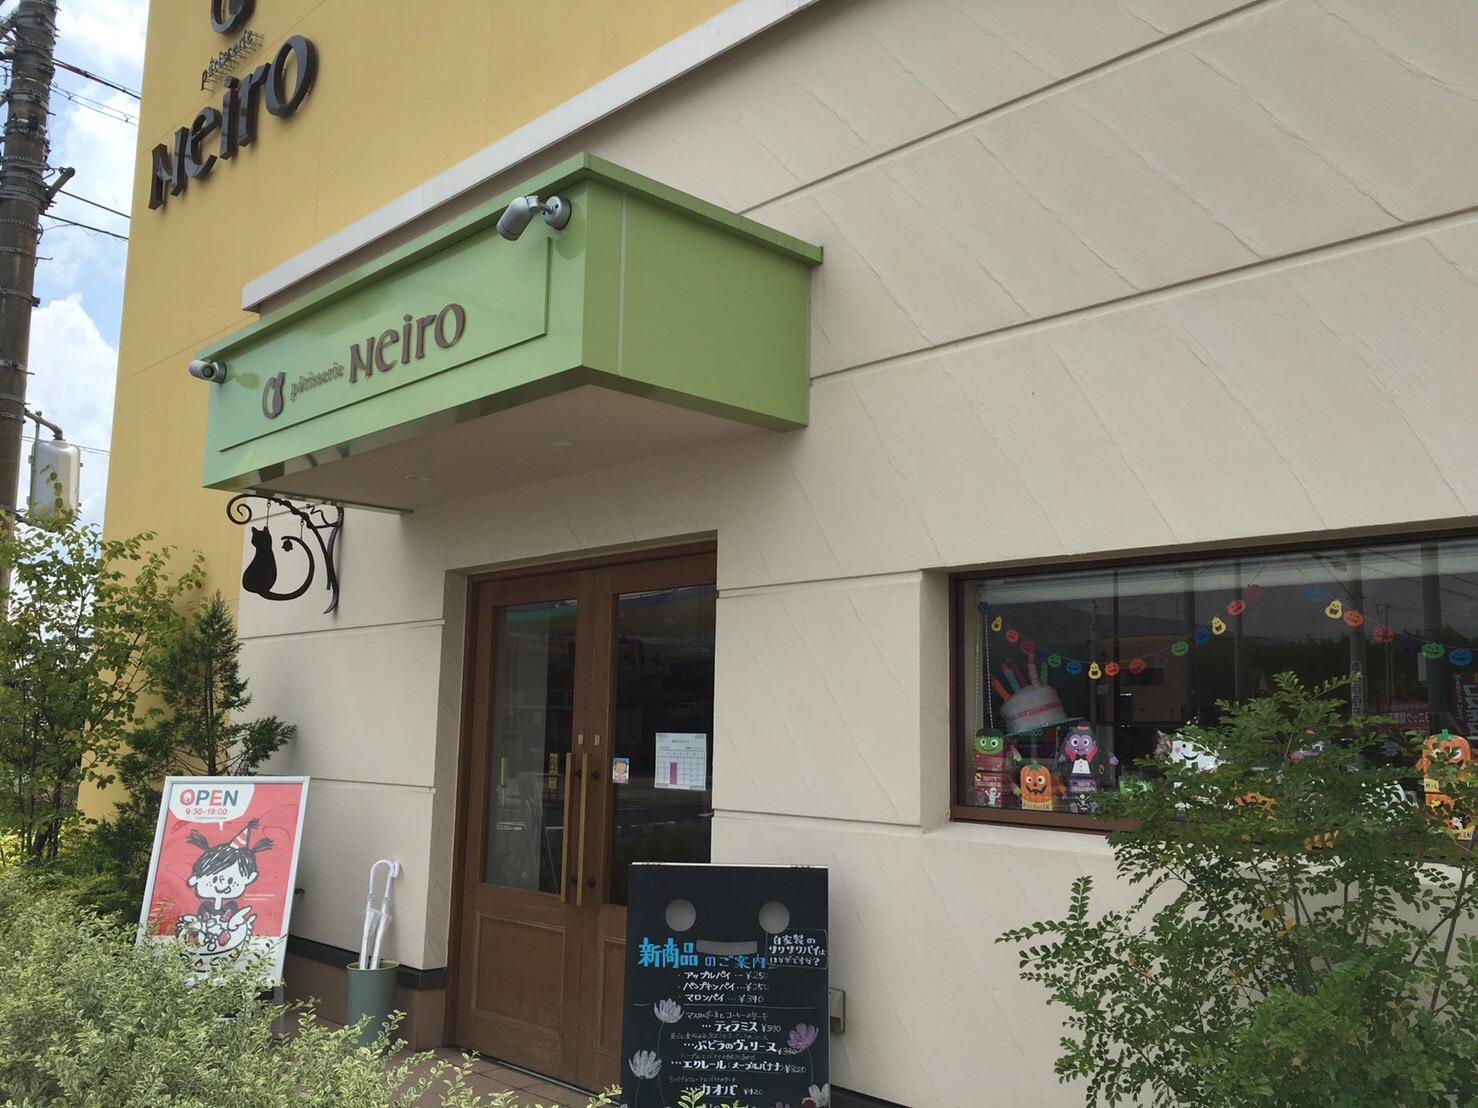 Neiro ネイロ( 奈良県橿原市/ ケーキ、洋菓子、スイーツ)